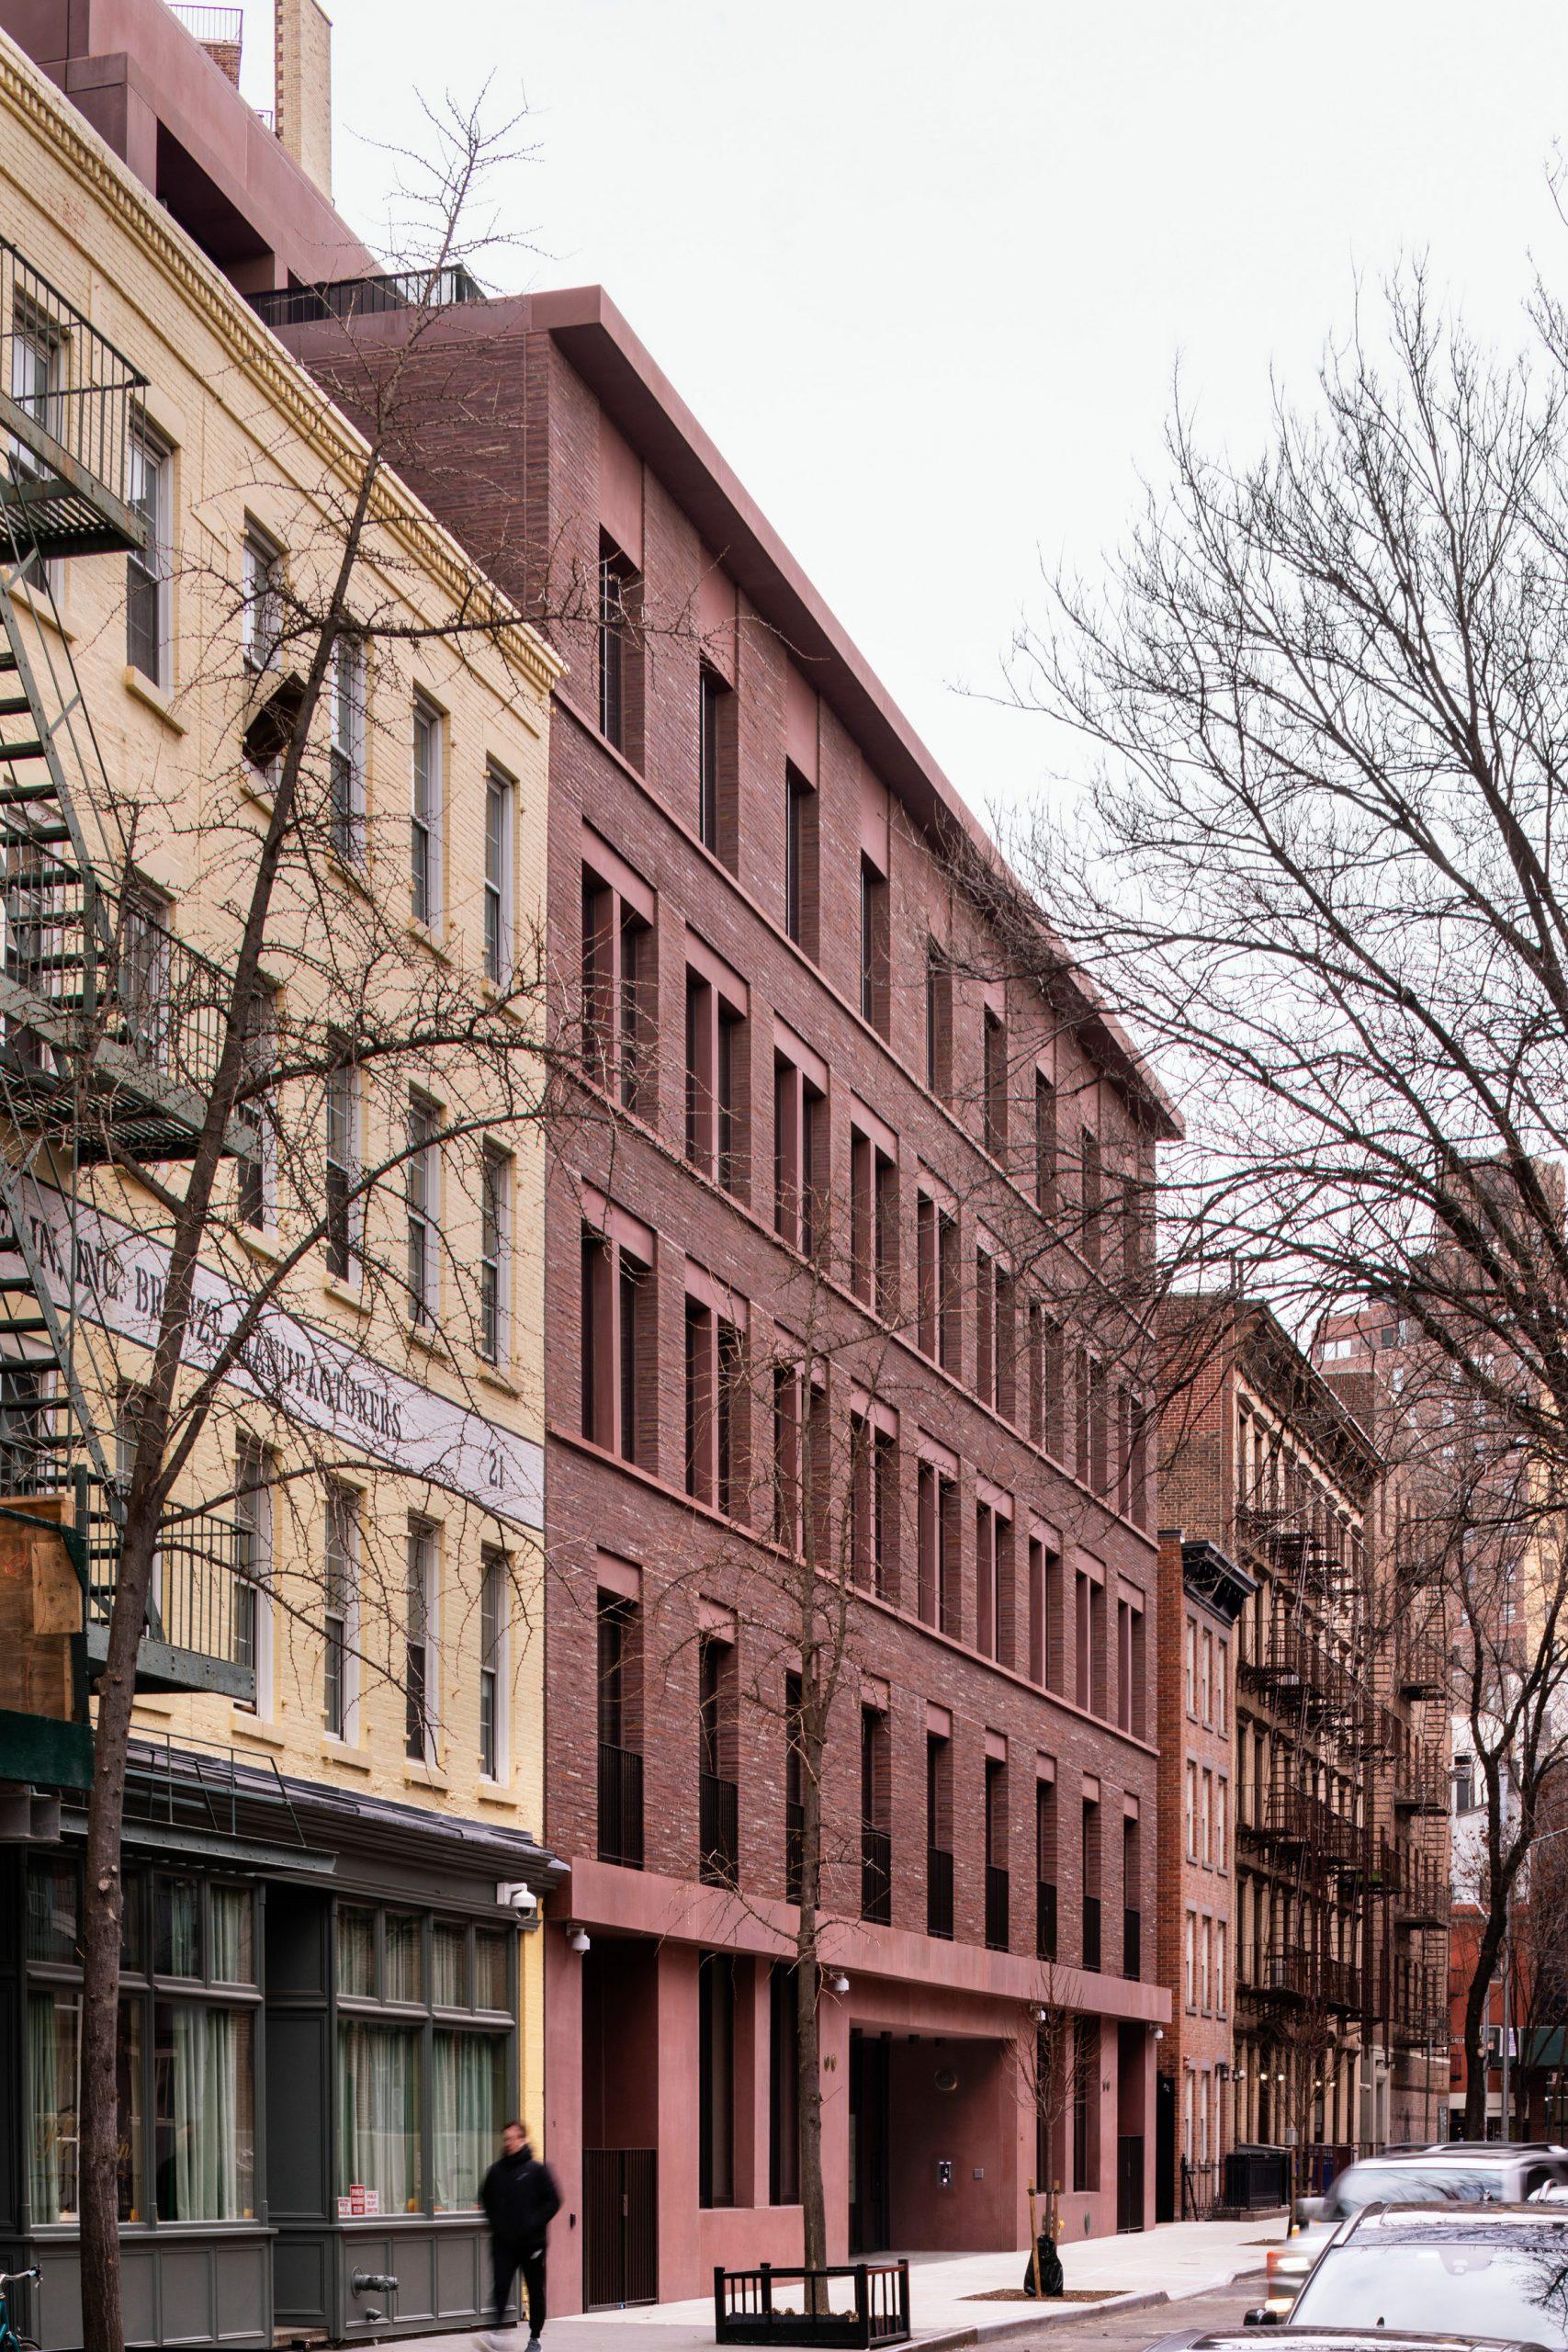 11-19 Jane Street in New York